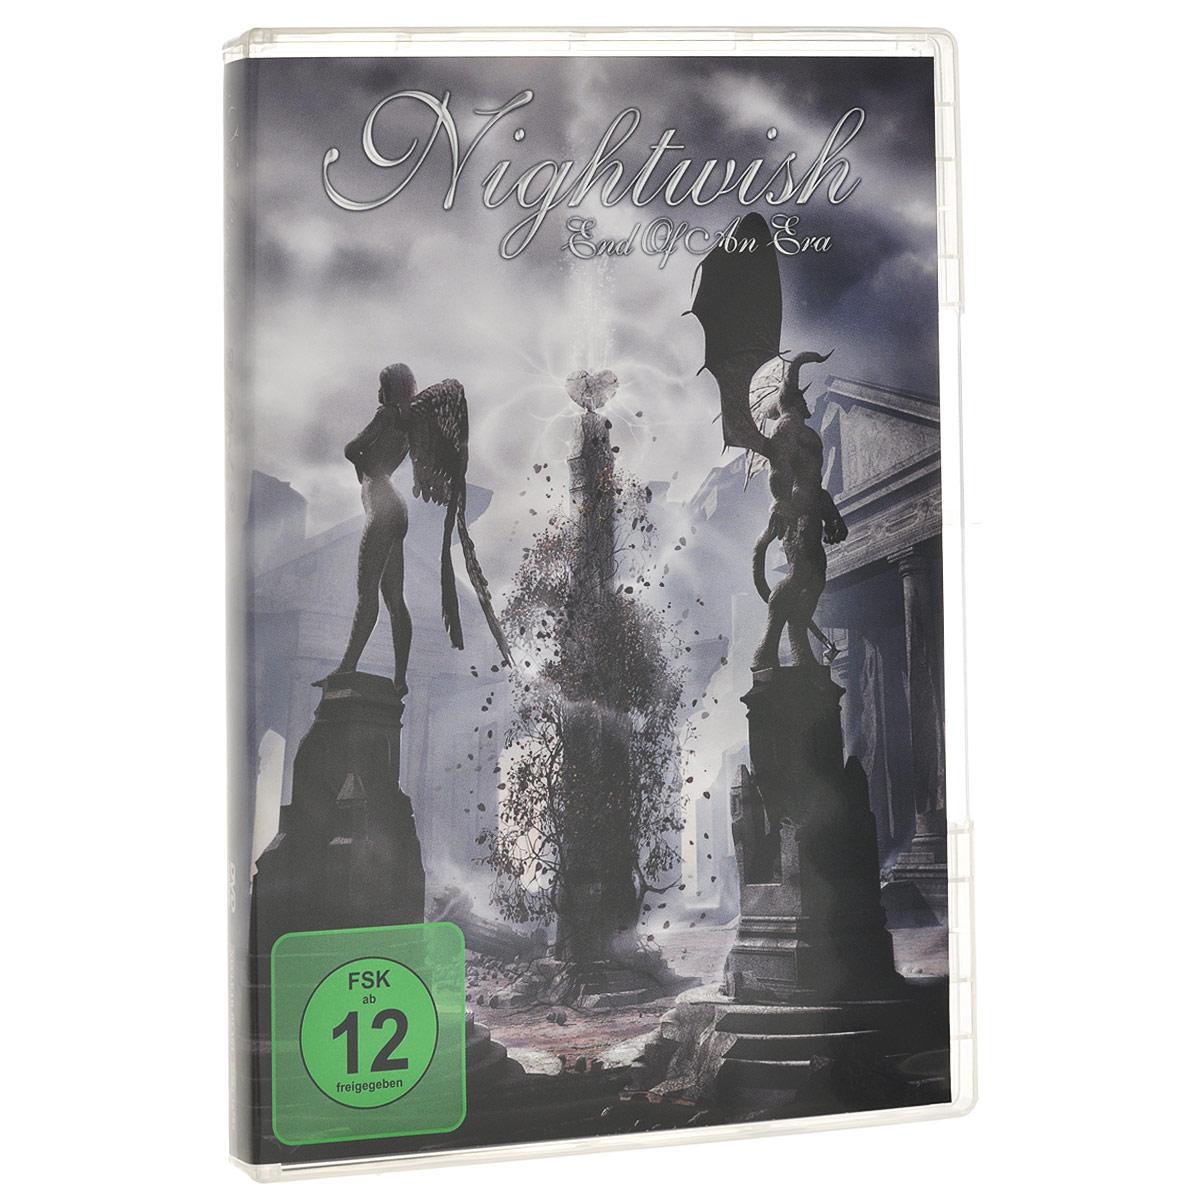 Nightwish End Of An Era. Live At Hartwall Areena